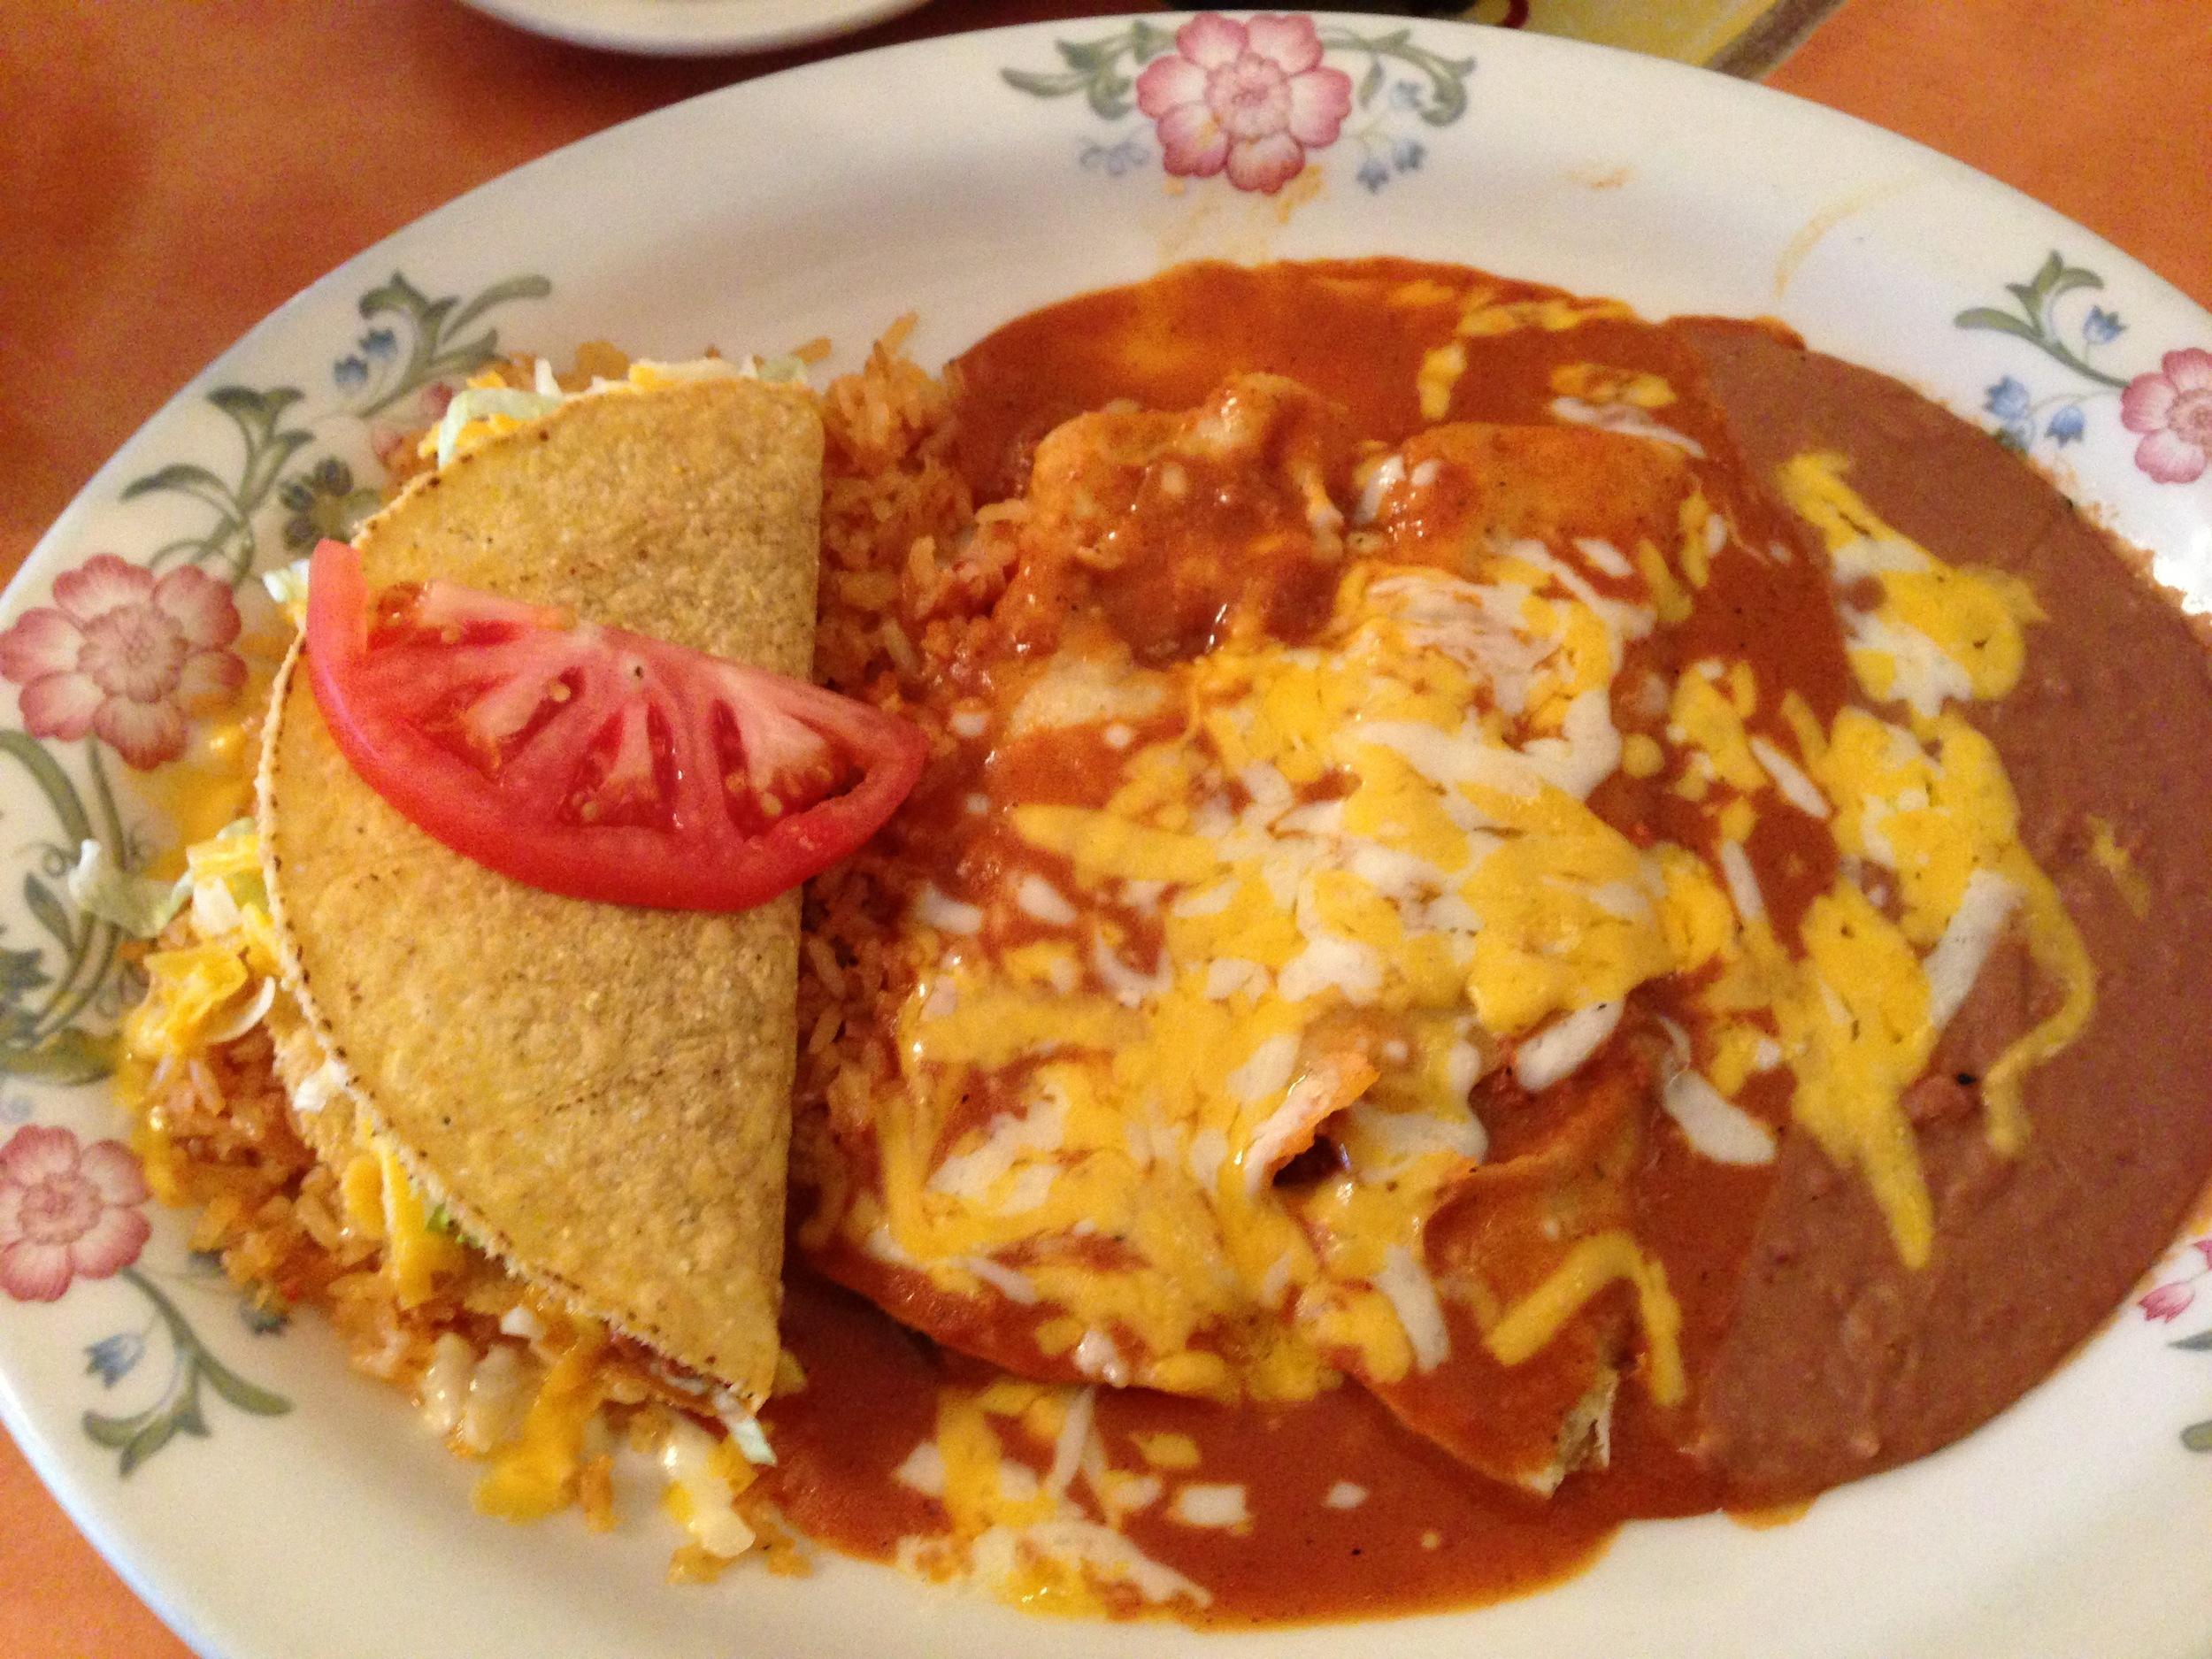 Combination Dinner - Enchiladas with a Taco